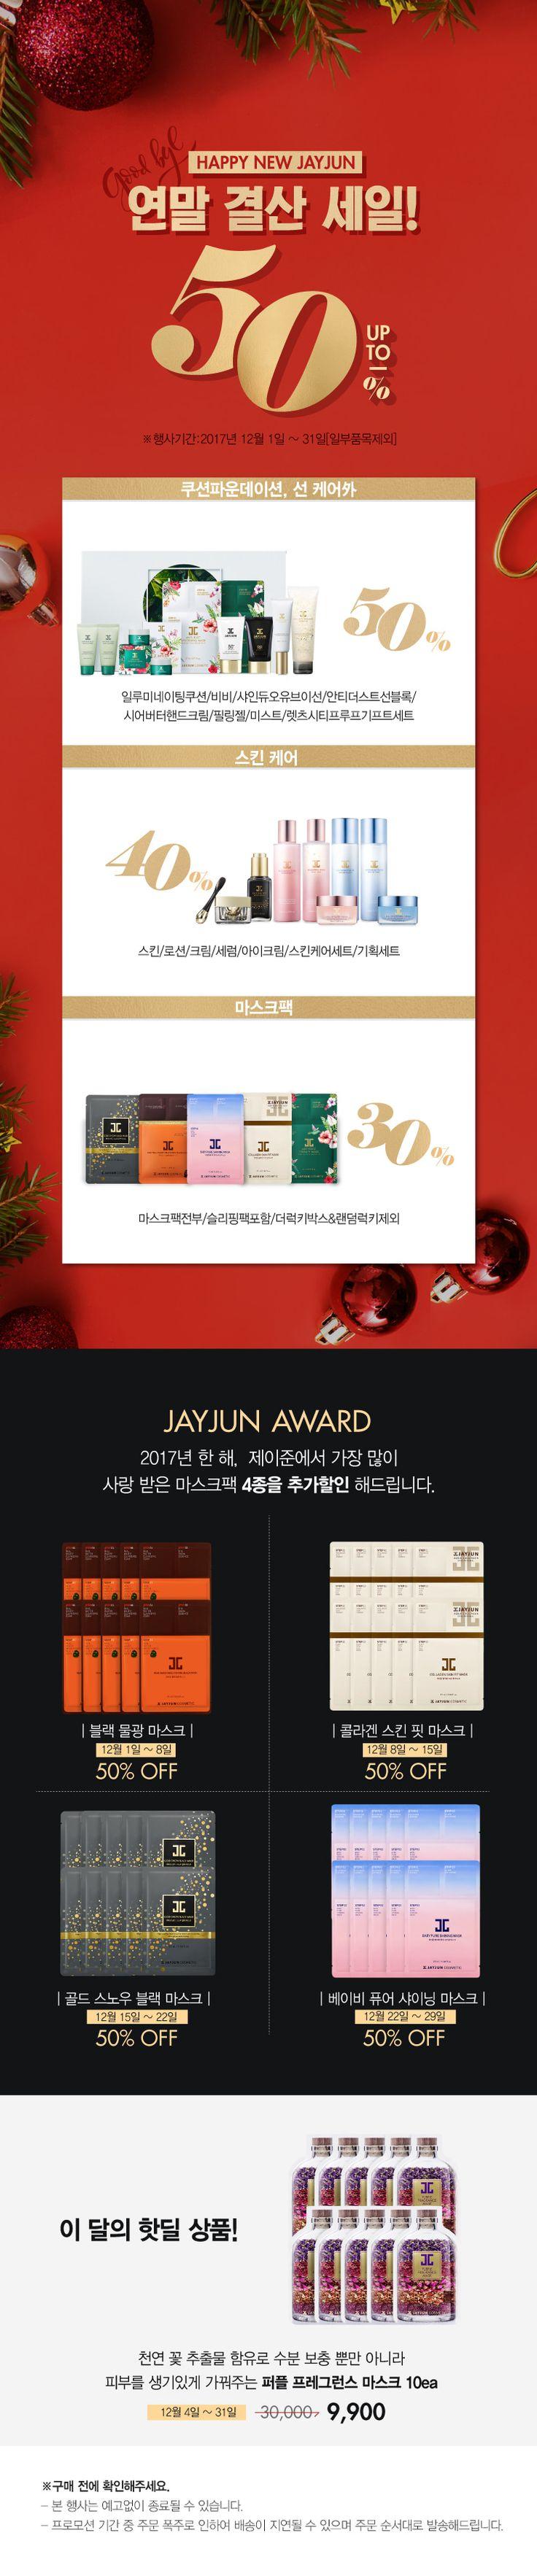 HAPPY NEW JAYJUN 연말 결산 세일! EVENT - 제이준코스메틱 공식쇼핑몰